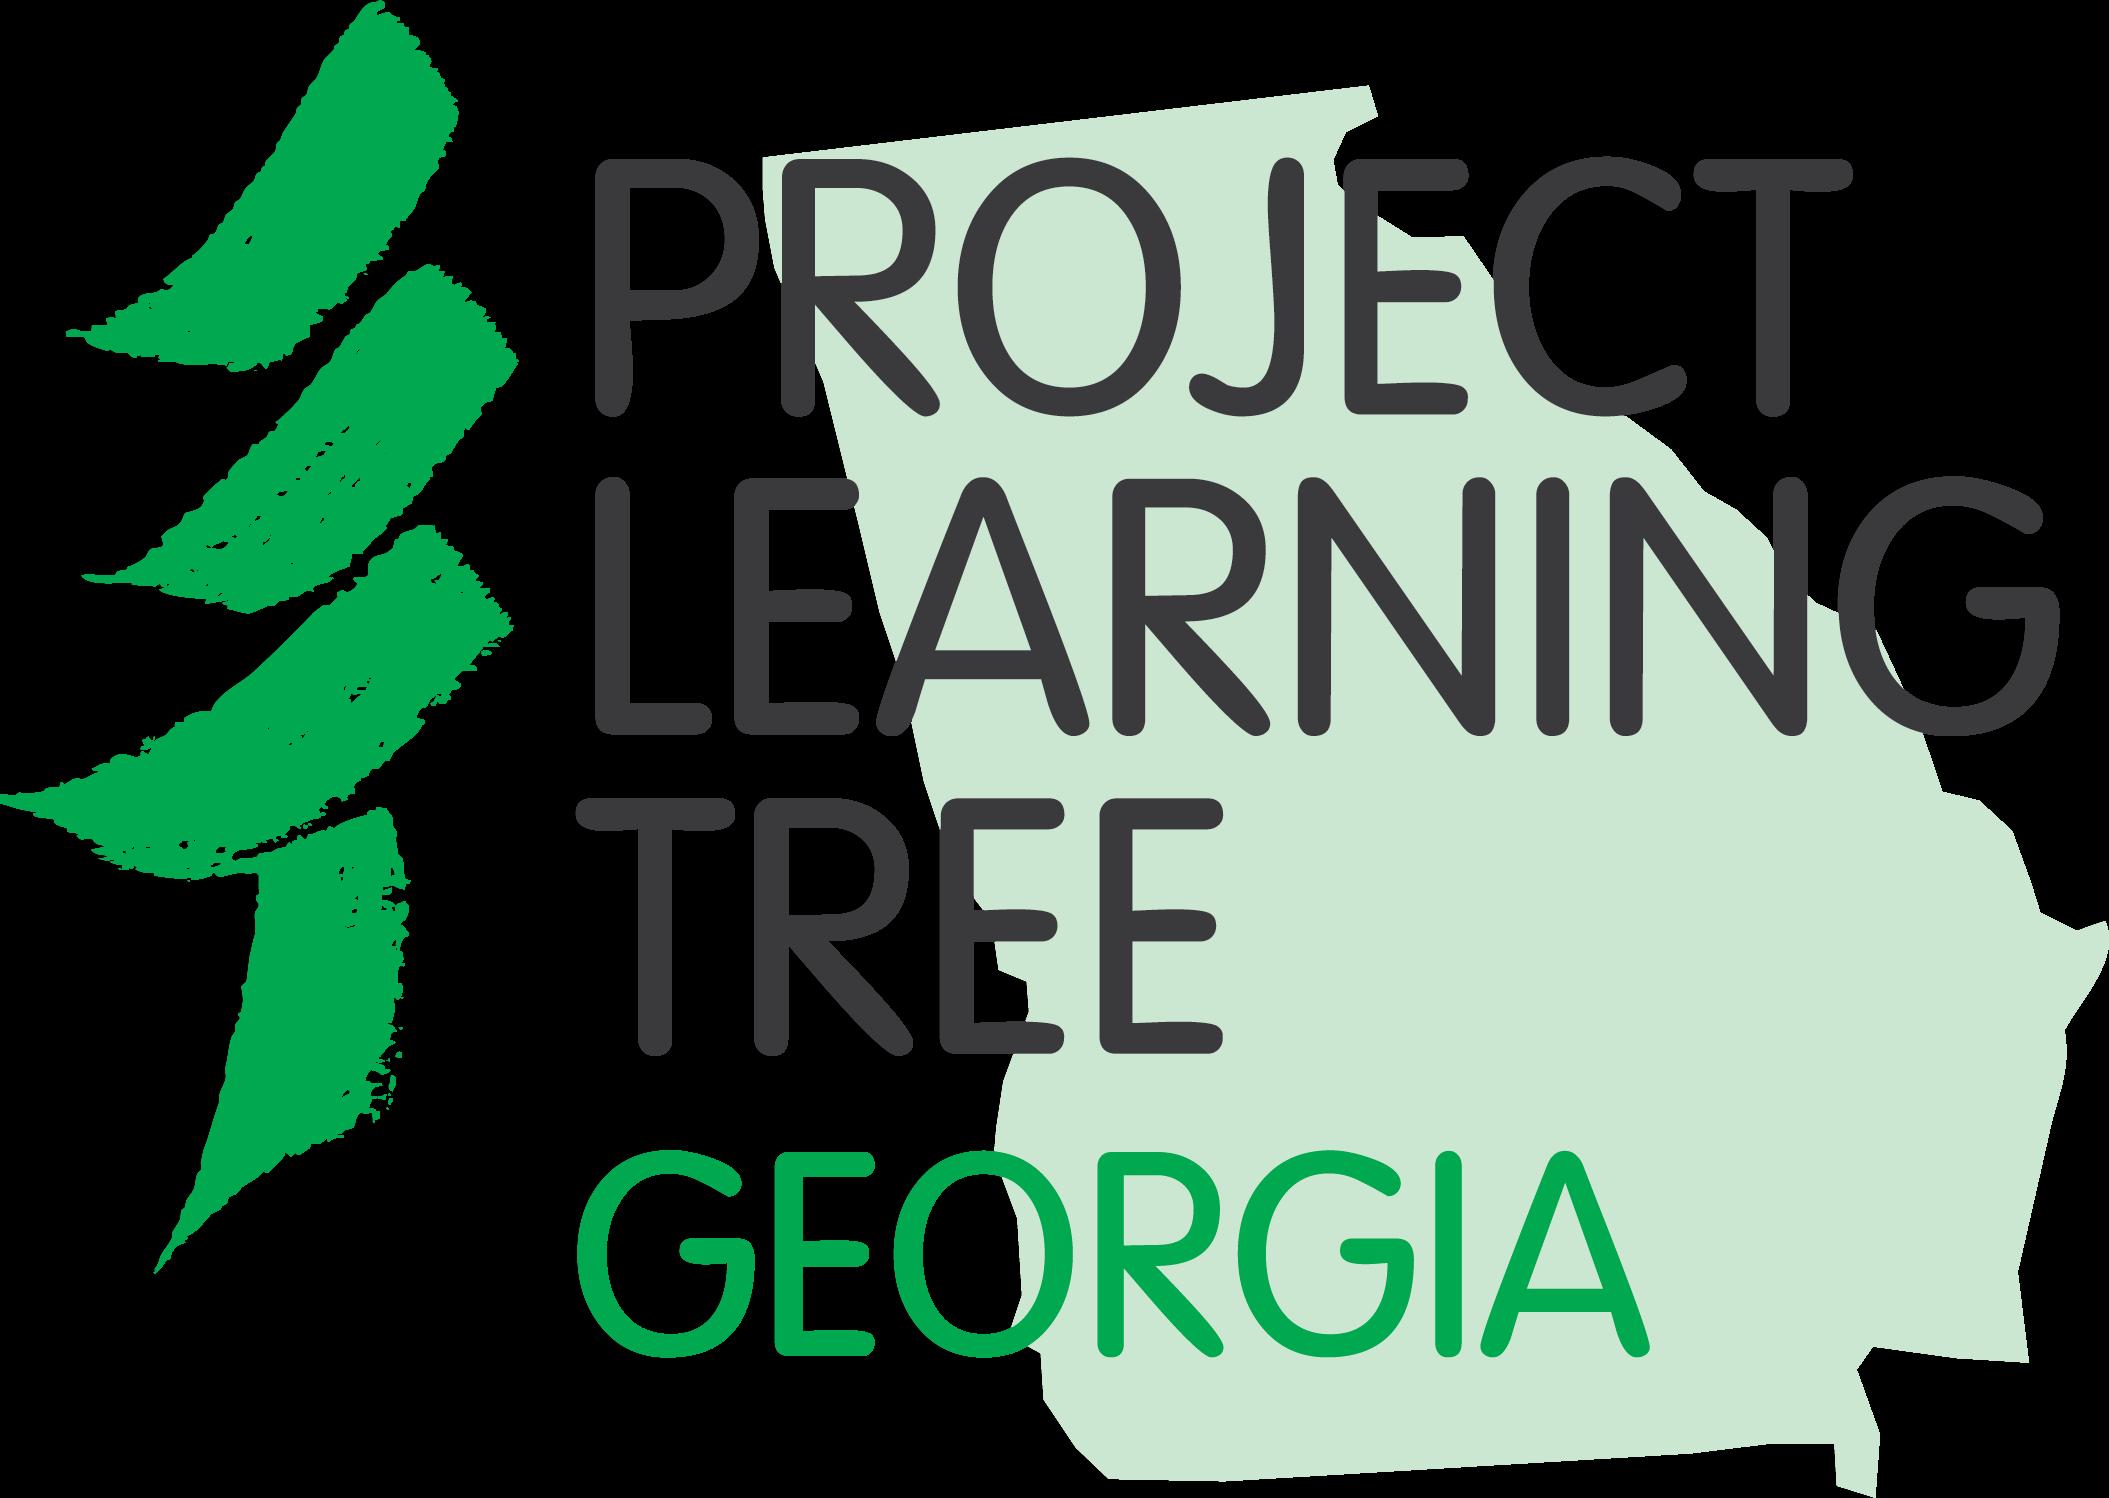 Georgia Project Learning Tree